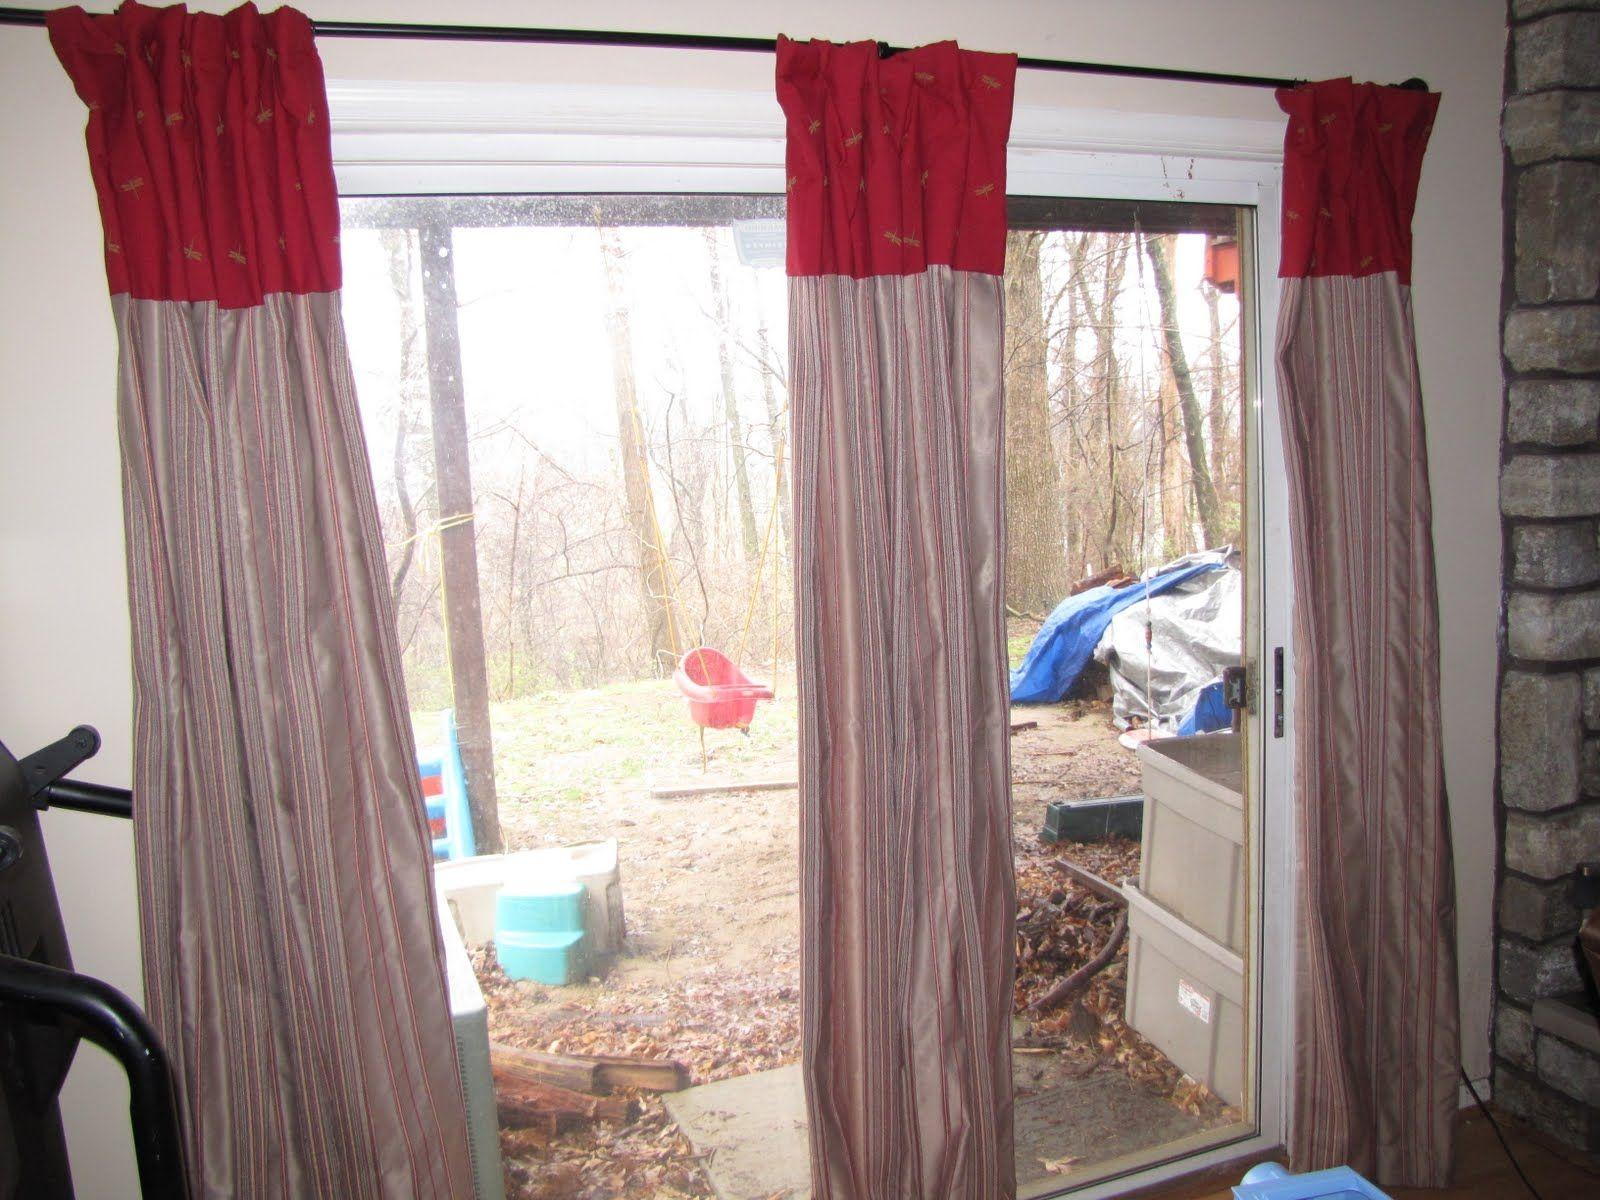 Design ideas for sliding glass door curtains togethersandia